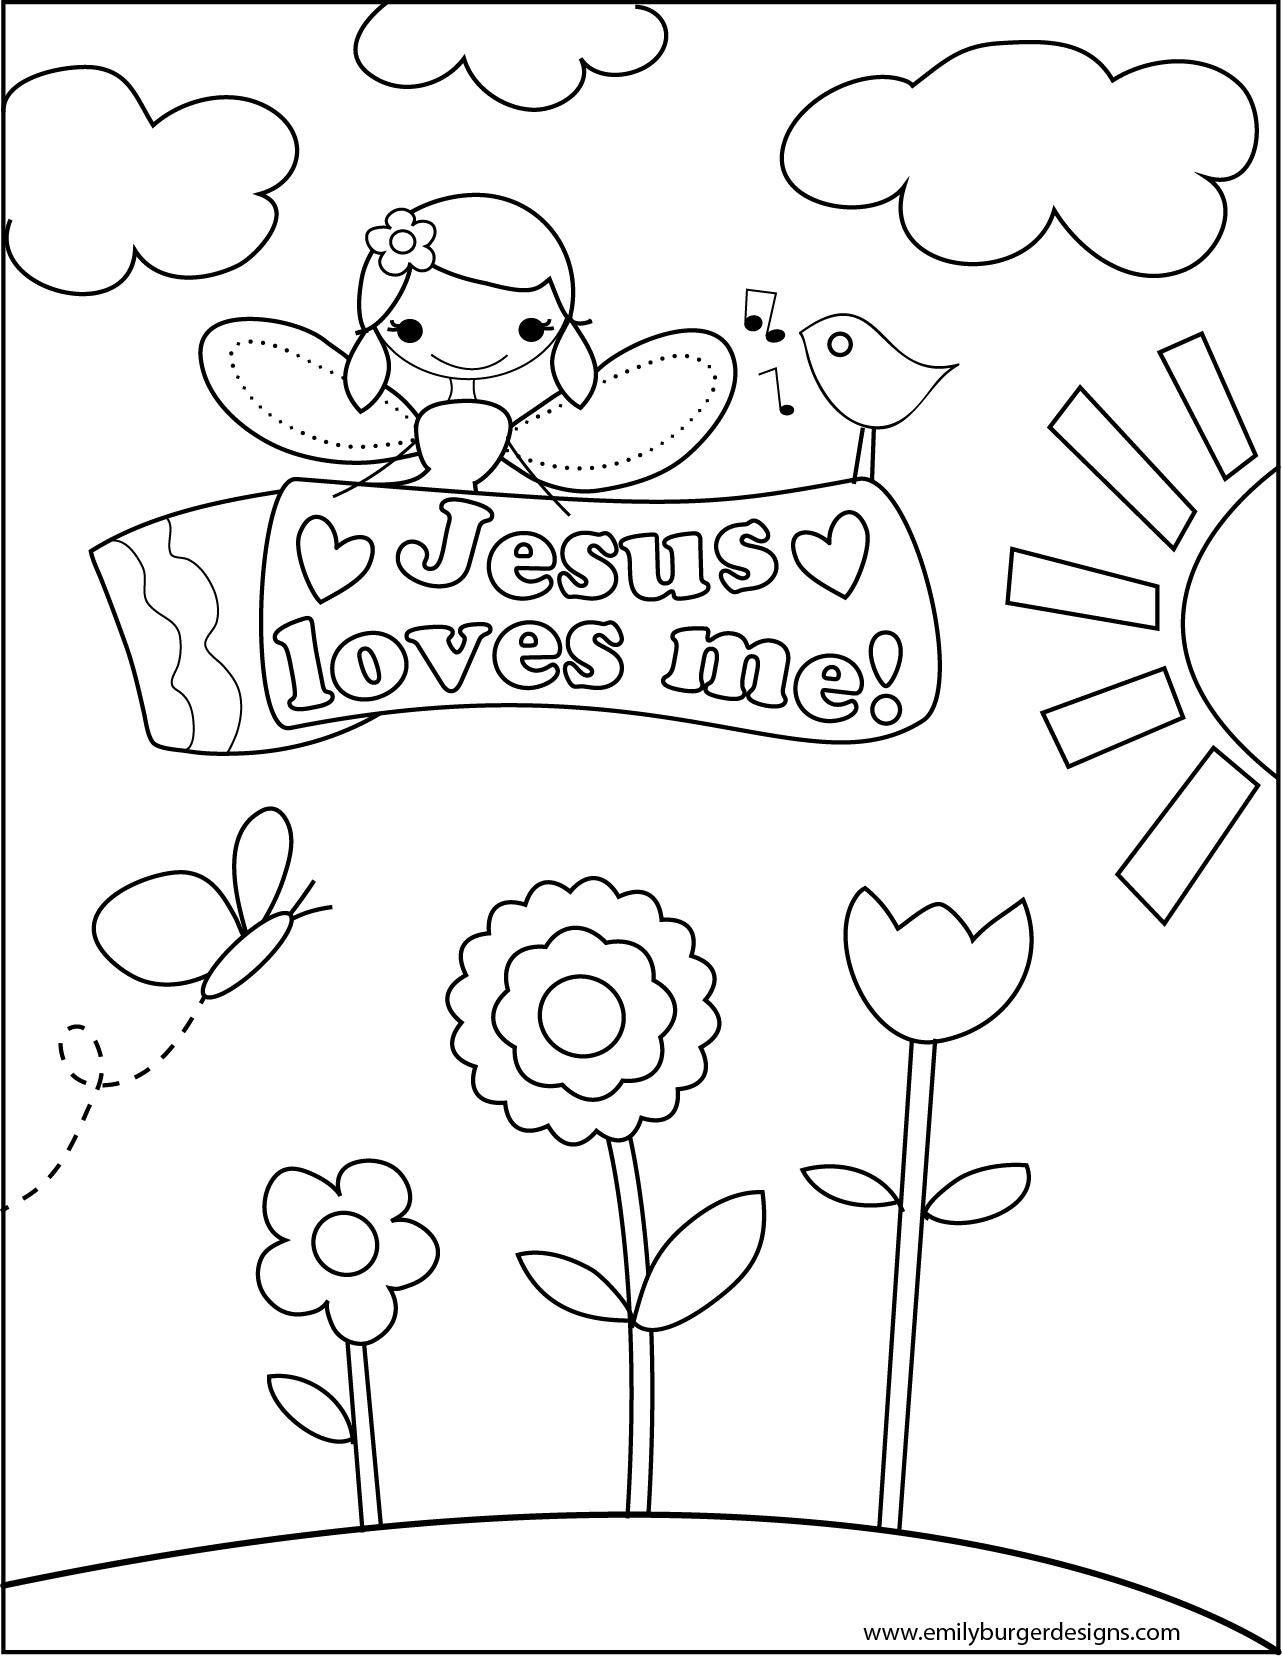 Fortune Jesus Loves Me Coloring Sheet God Pages Designs